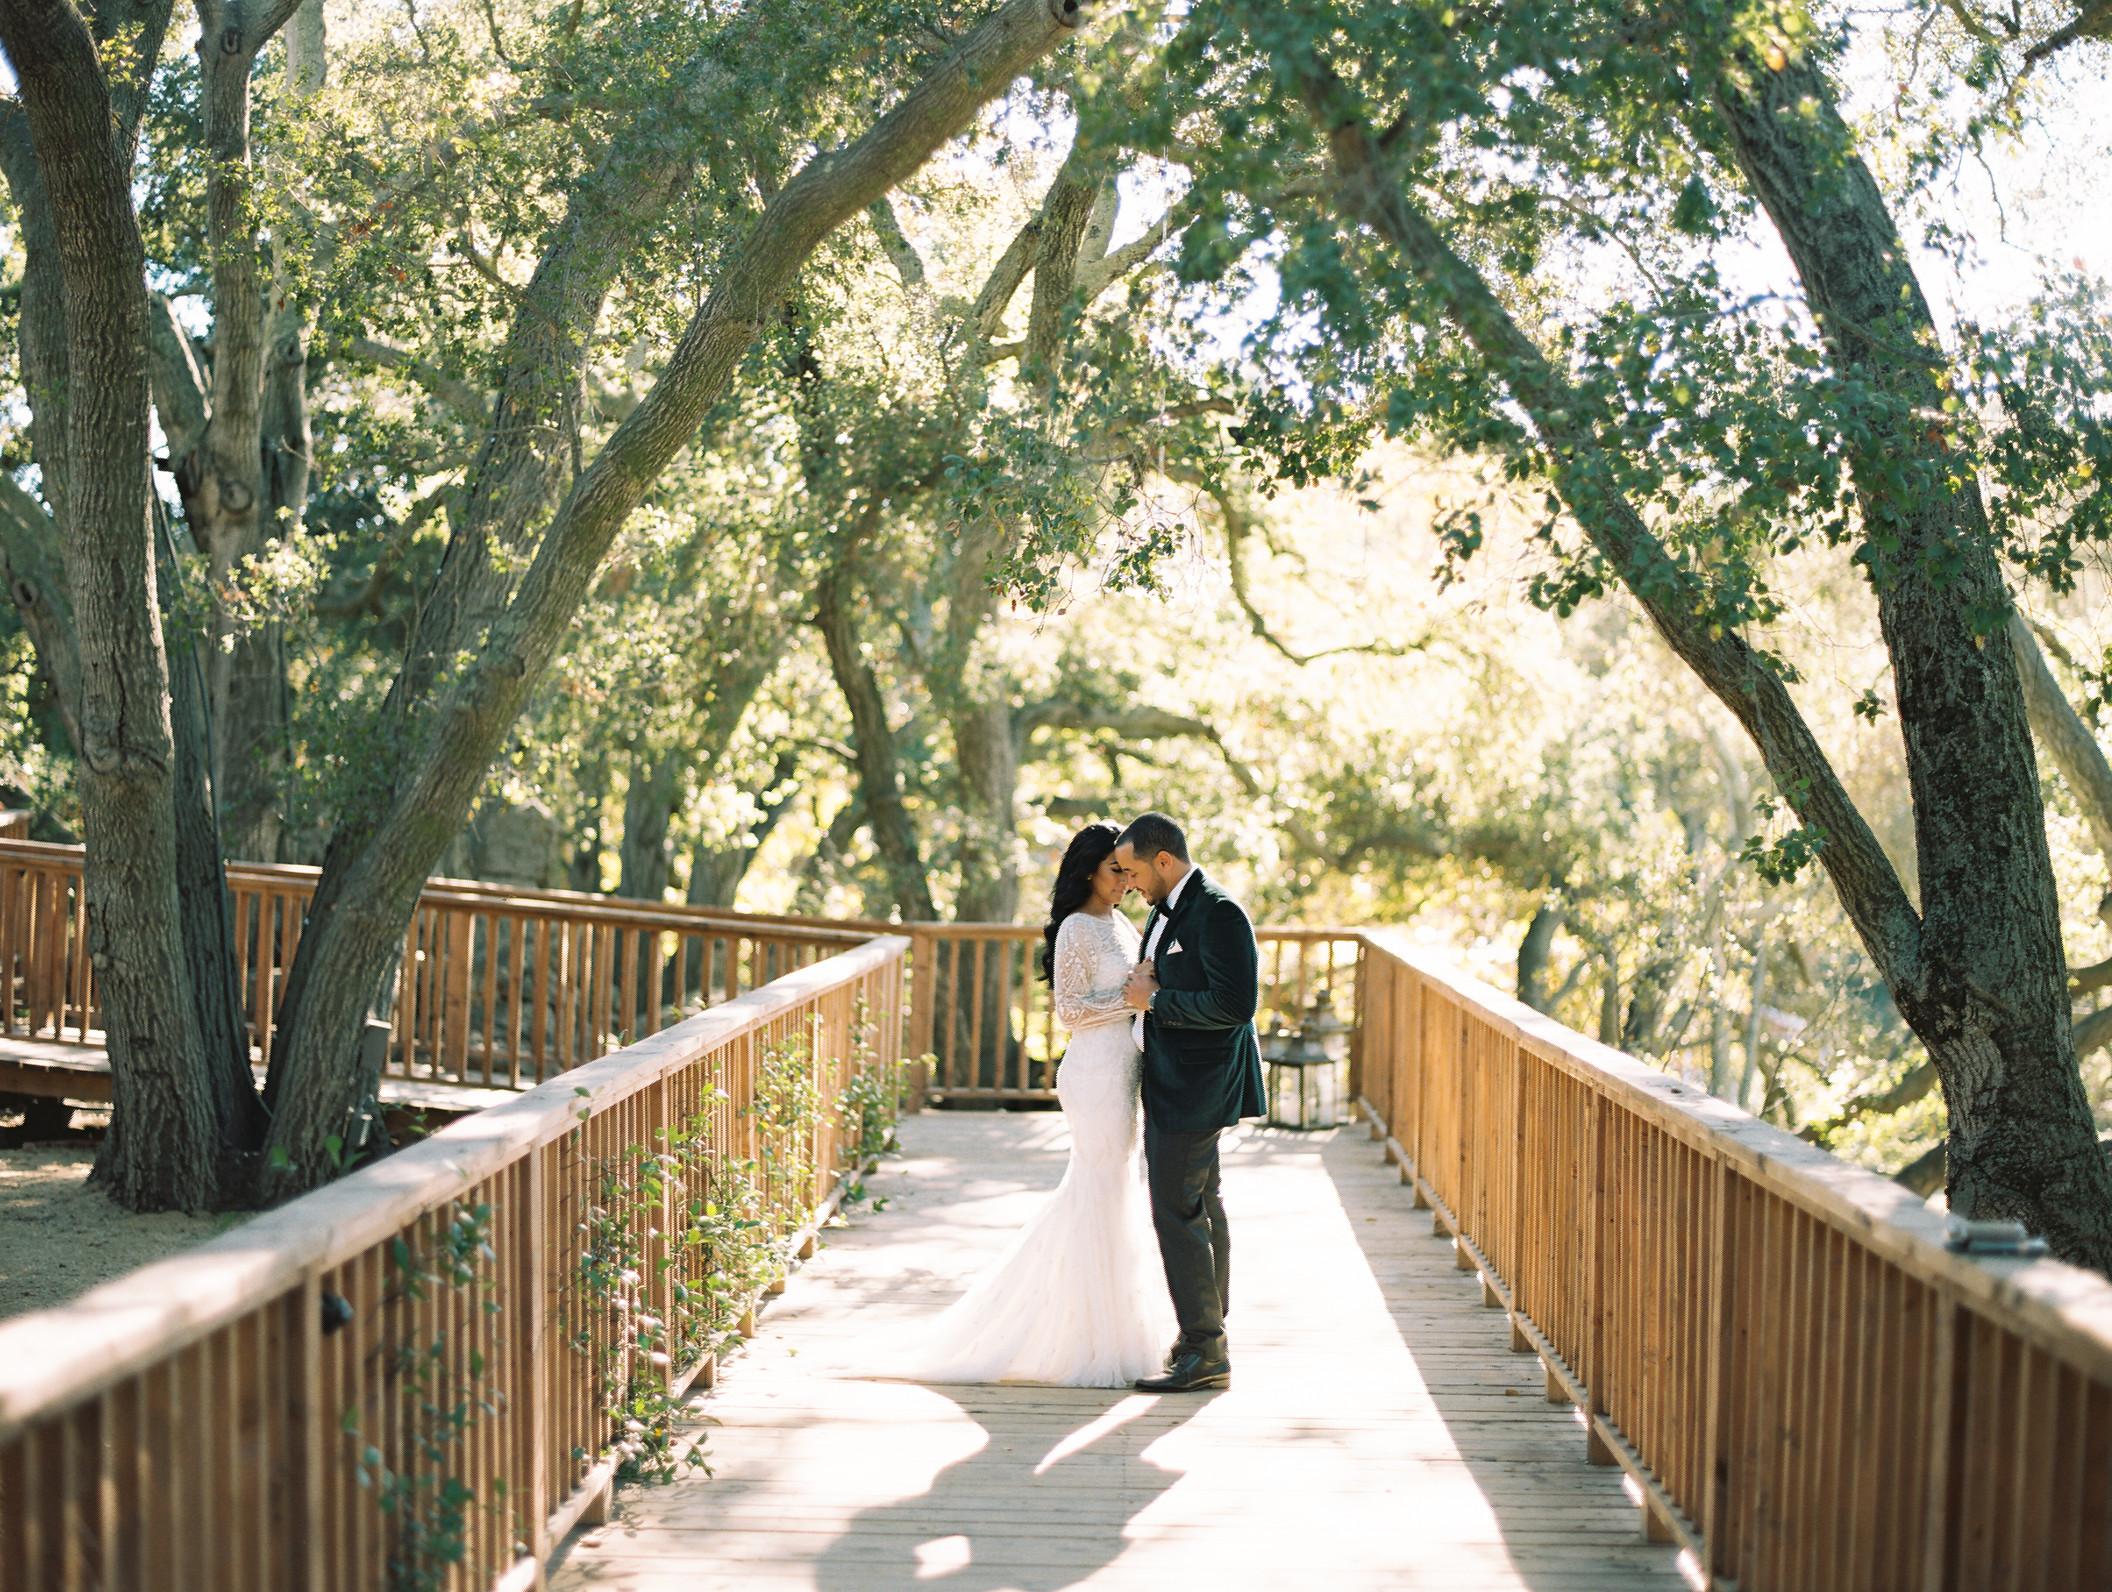 240-fine-art-film-kristopher-veronica-malibu-wedding-brumley-wells-2112x1592.jpg